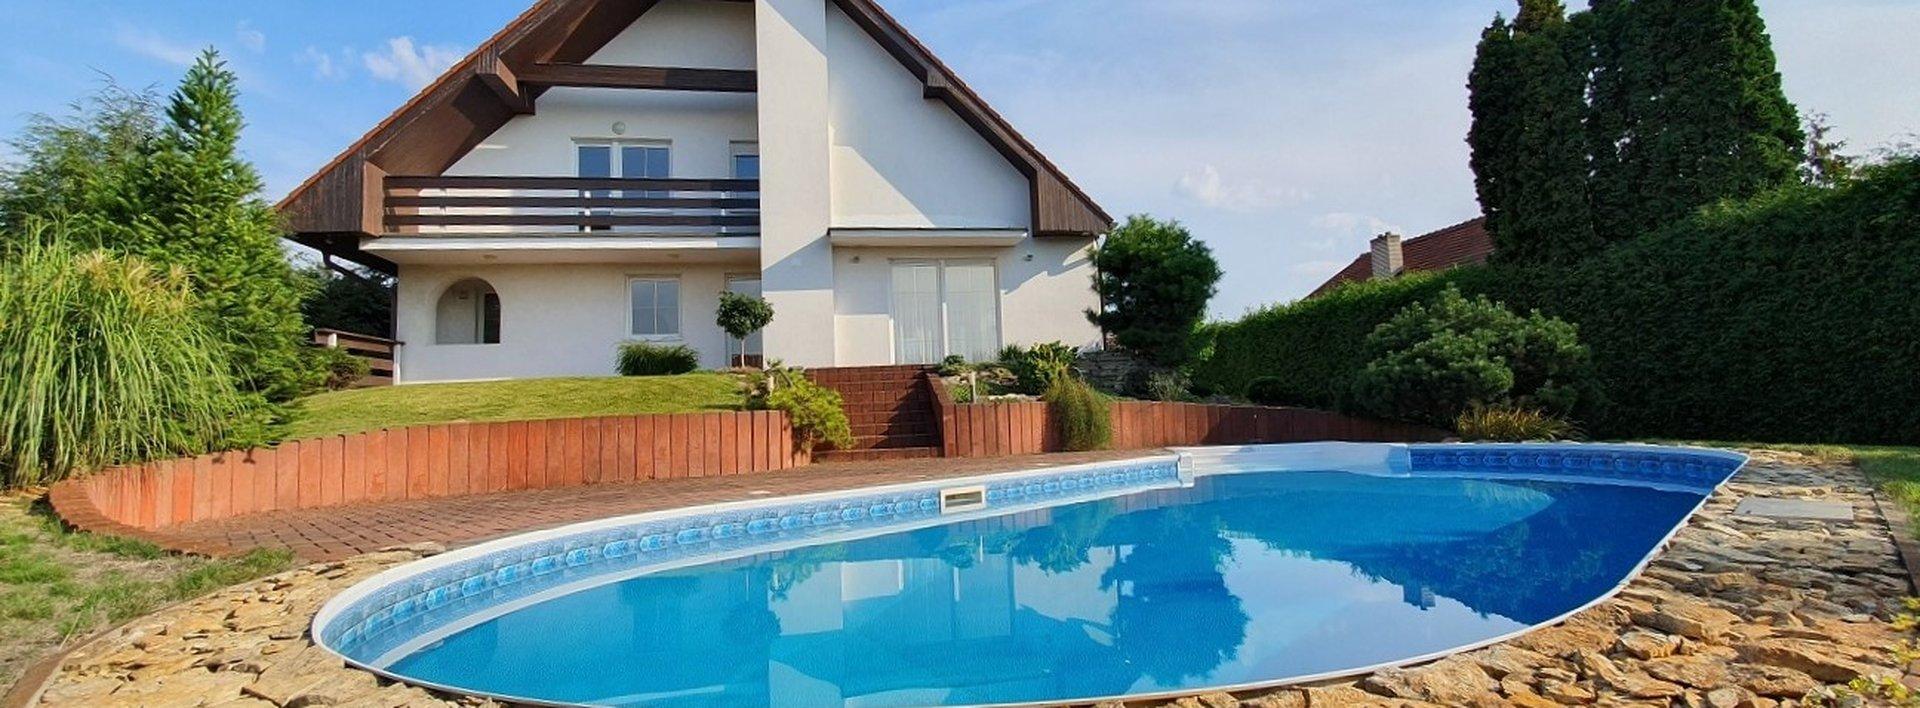 Prostorný dům s bazénem a krásnou zahradou, 1012 m² - Lázně Bohdaneč, Ev.č.: N48850